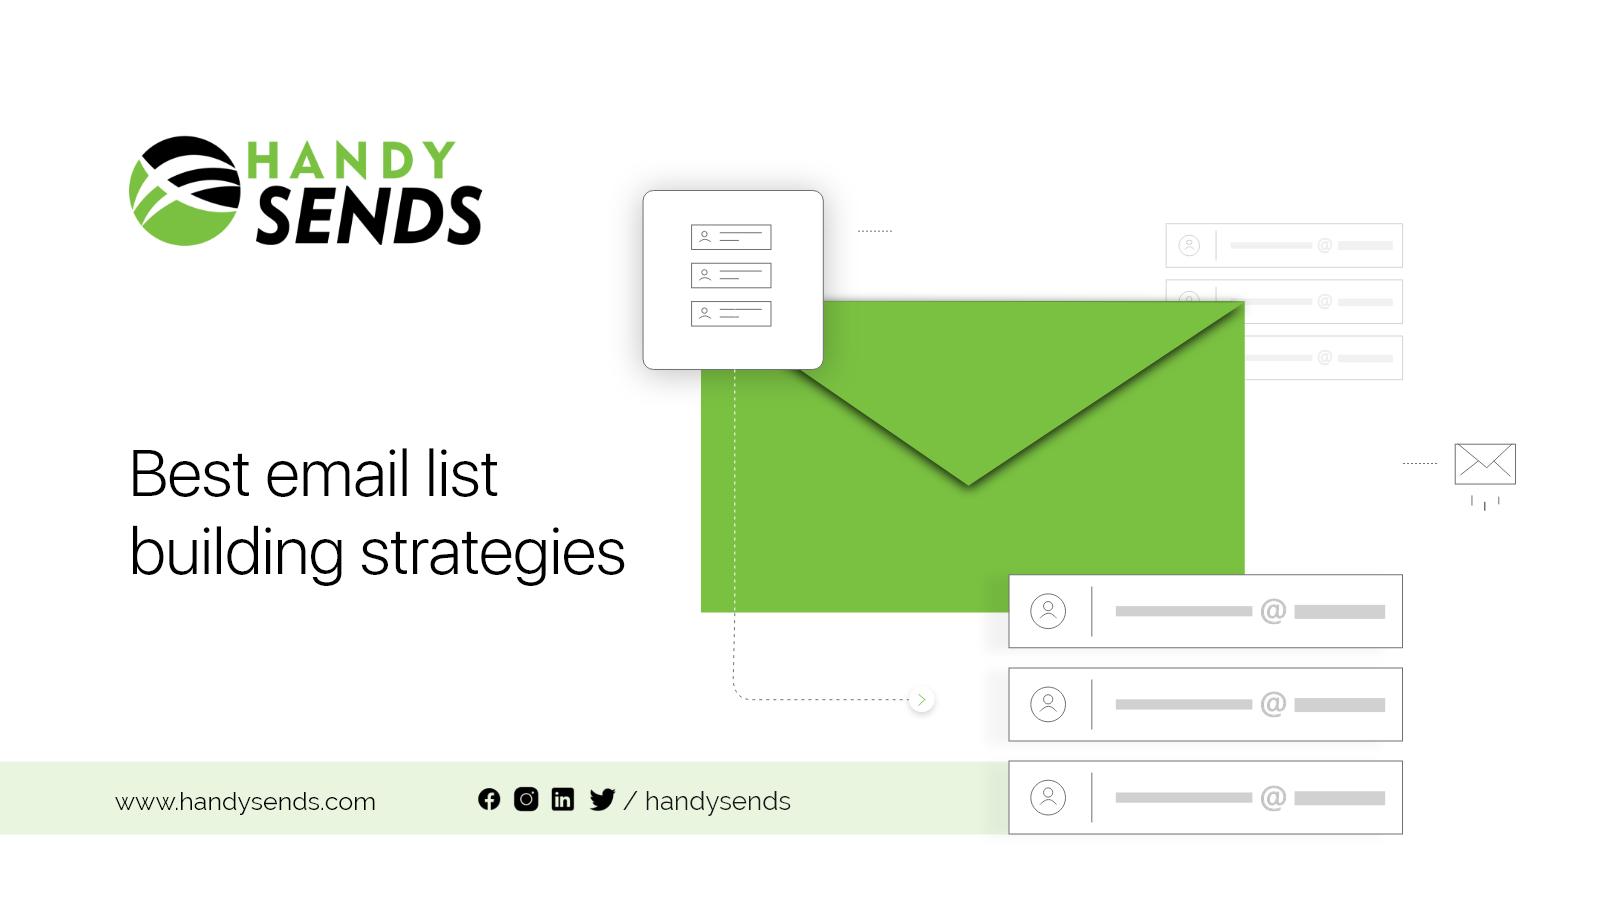 Best Email List building strategies